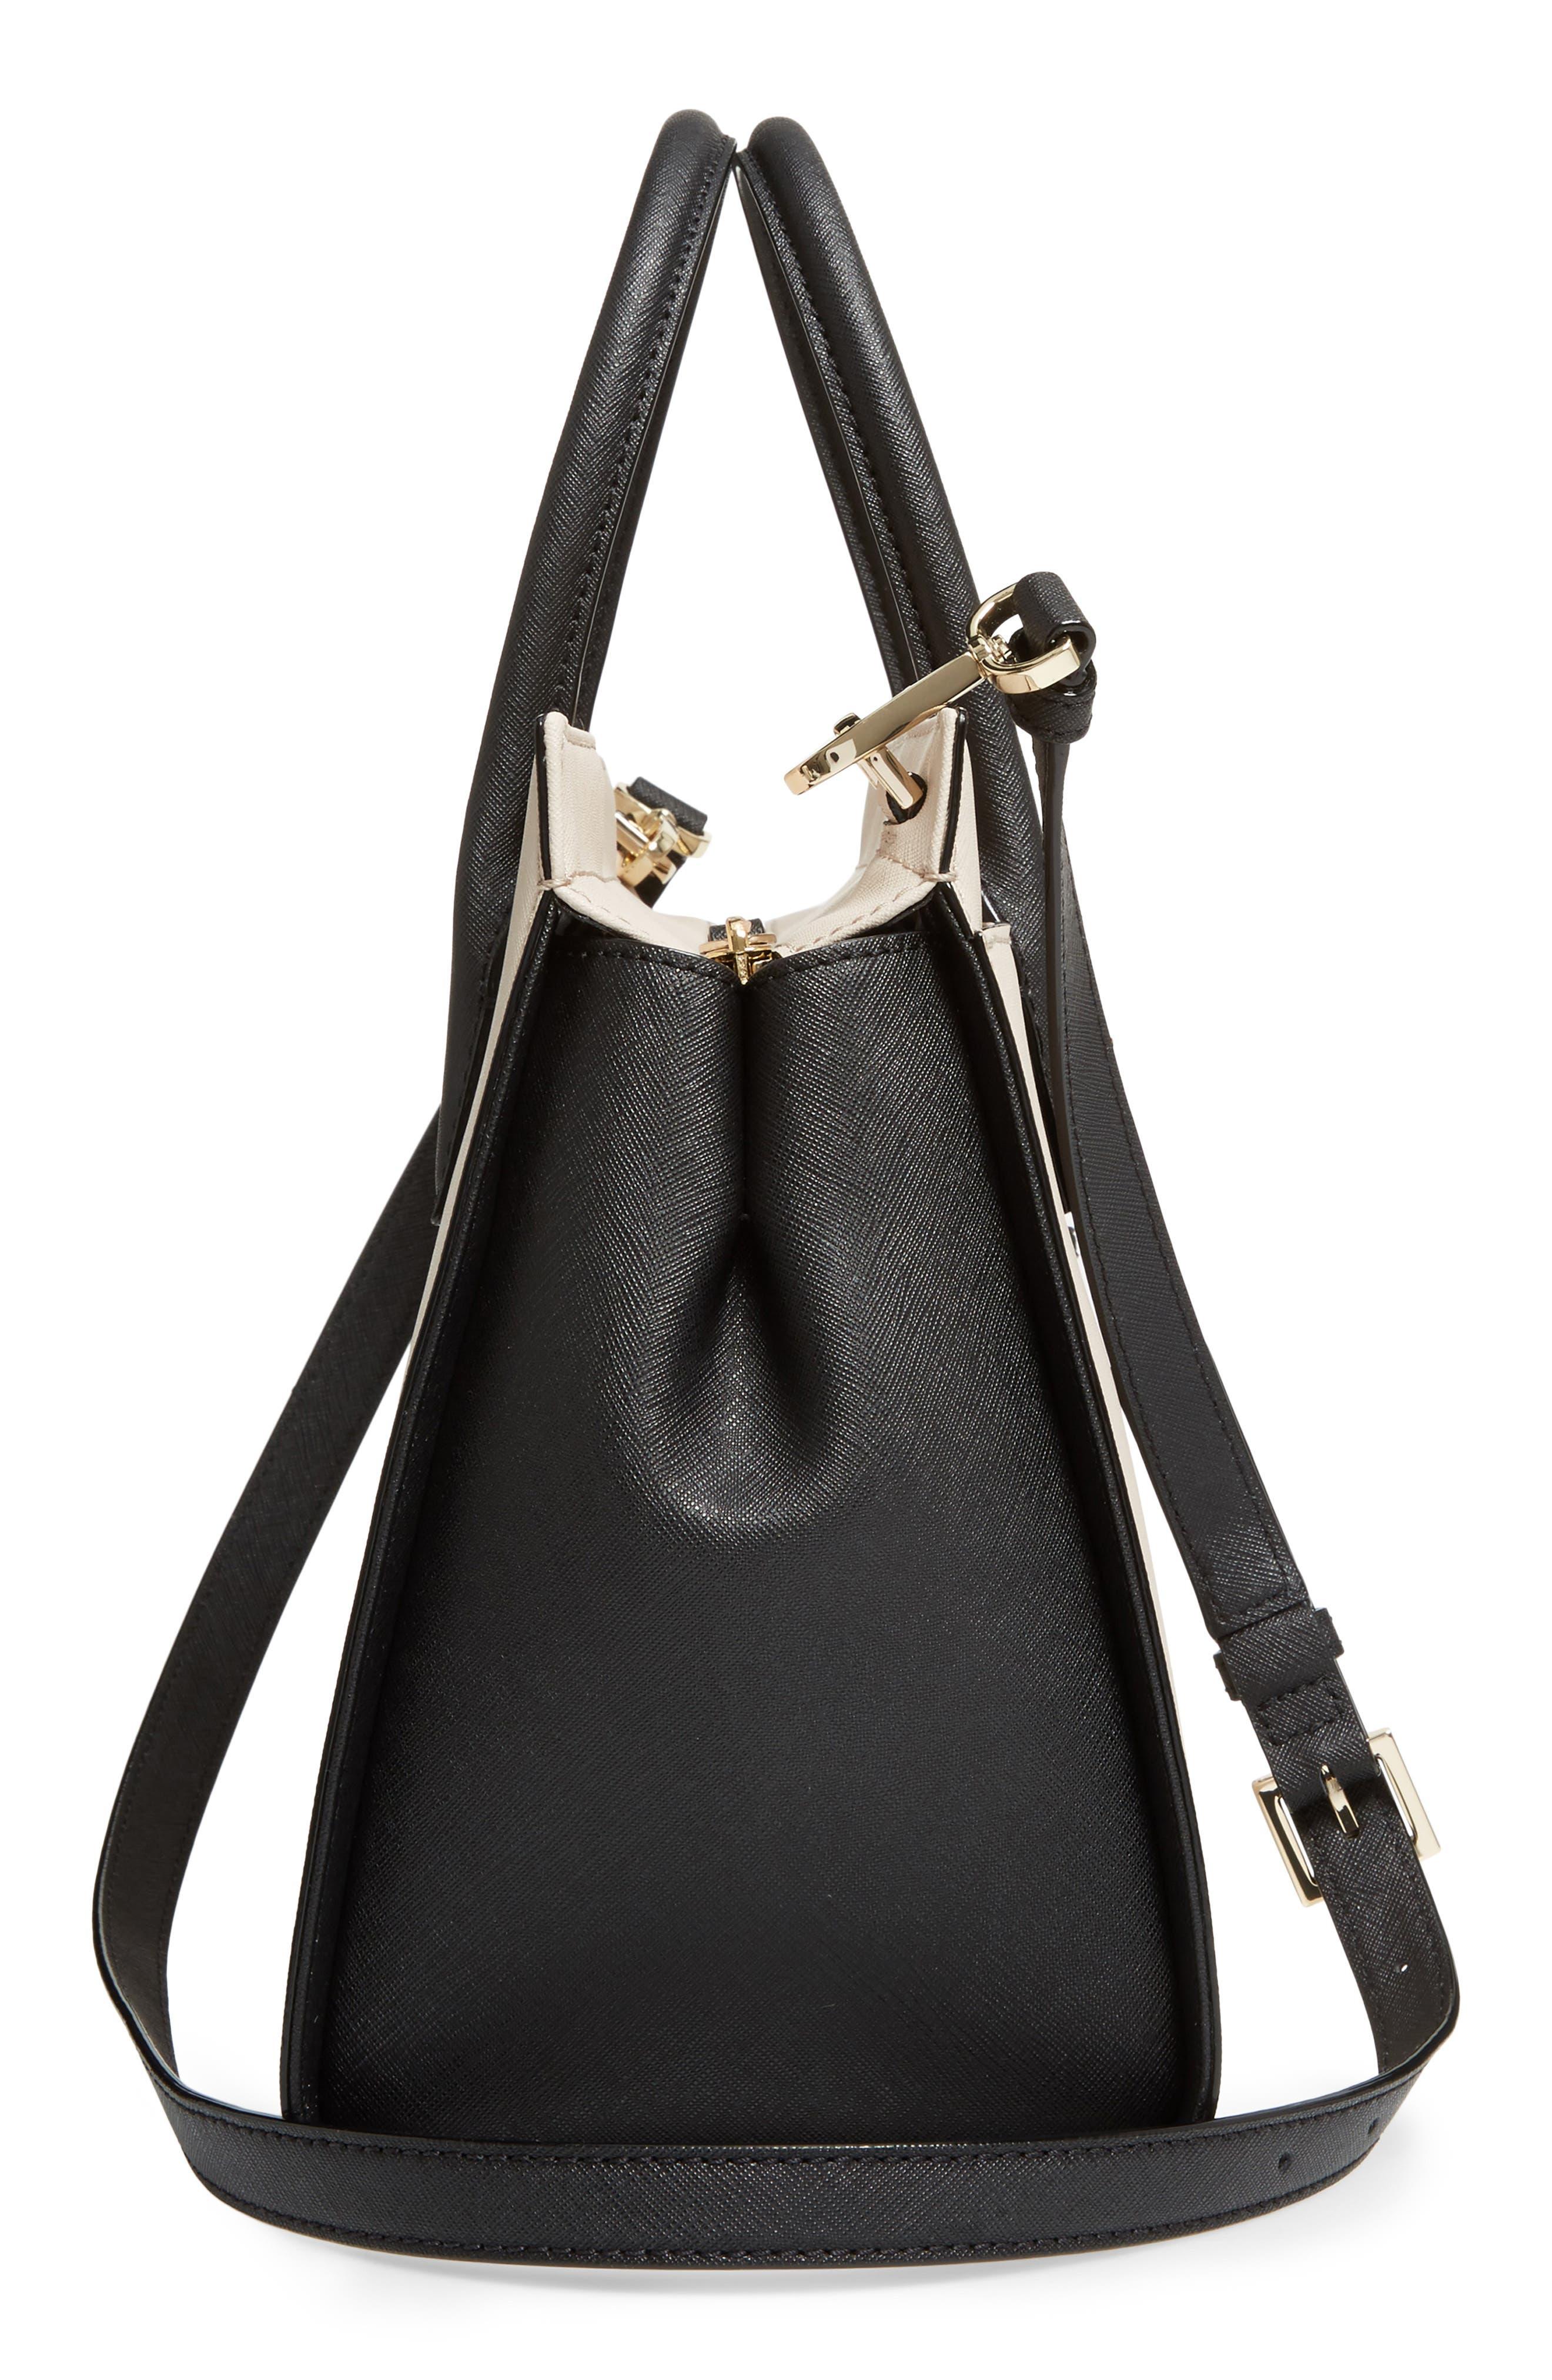 cameron street - candace leather satchel,                             Alternate thumbnail 5, color,                             Tusk/ Black